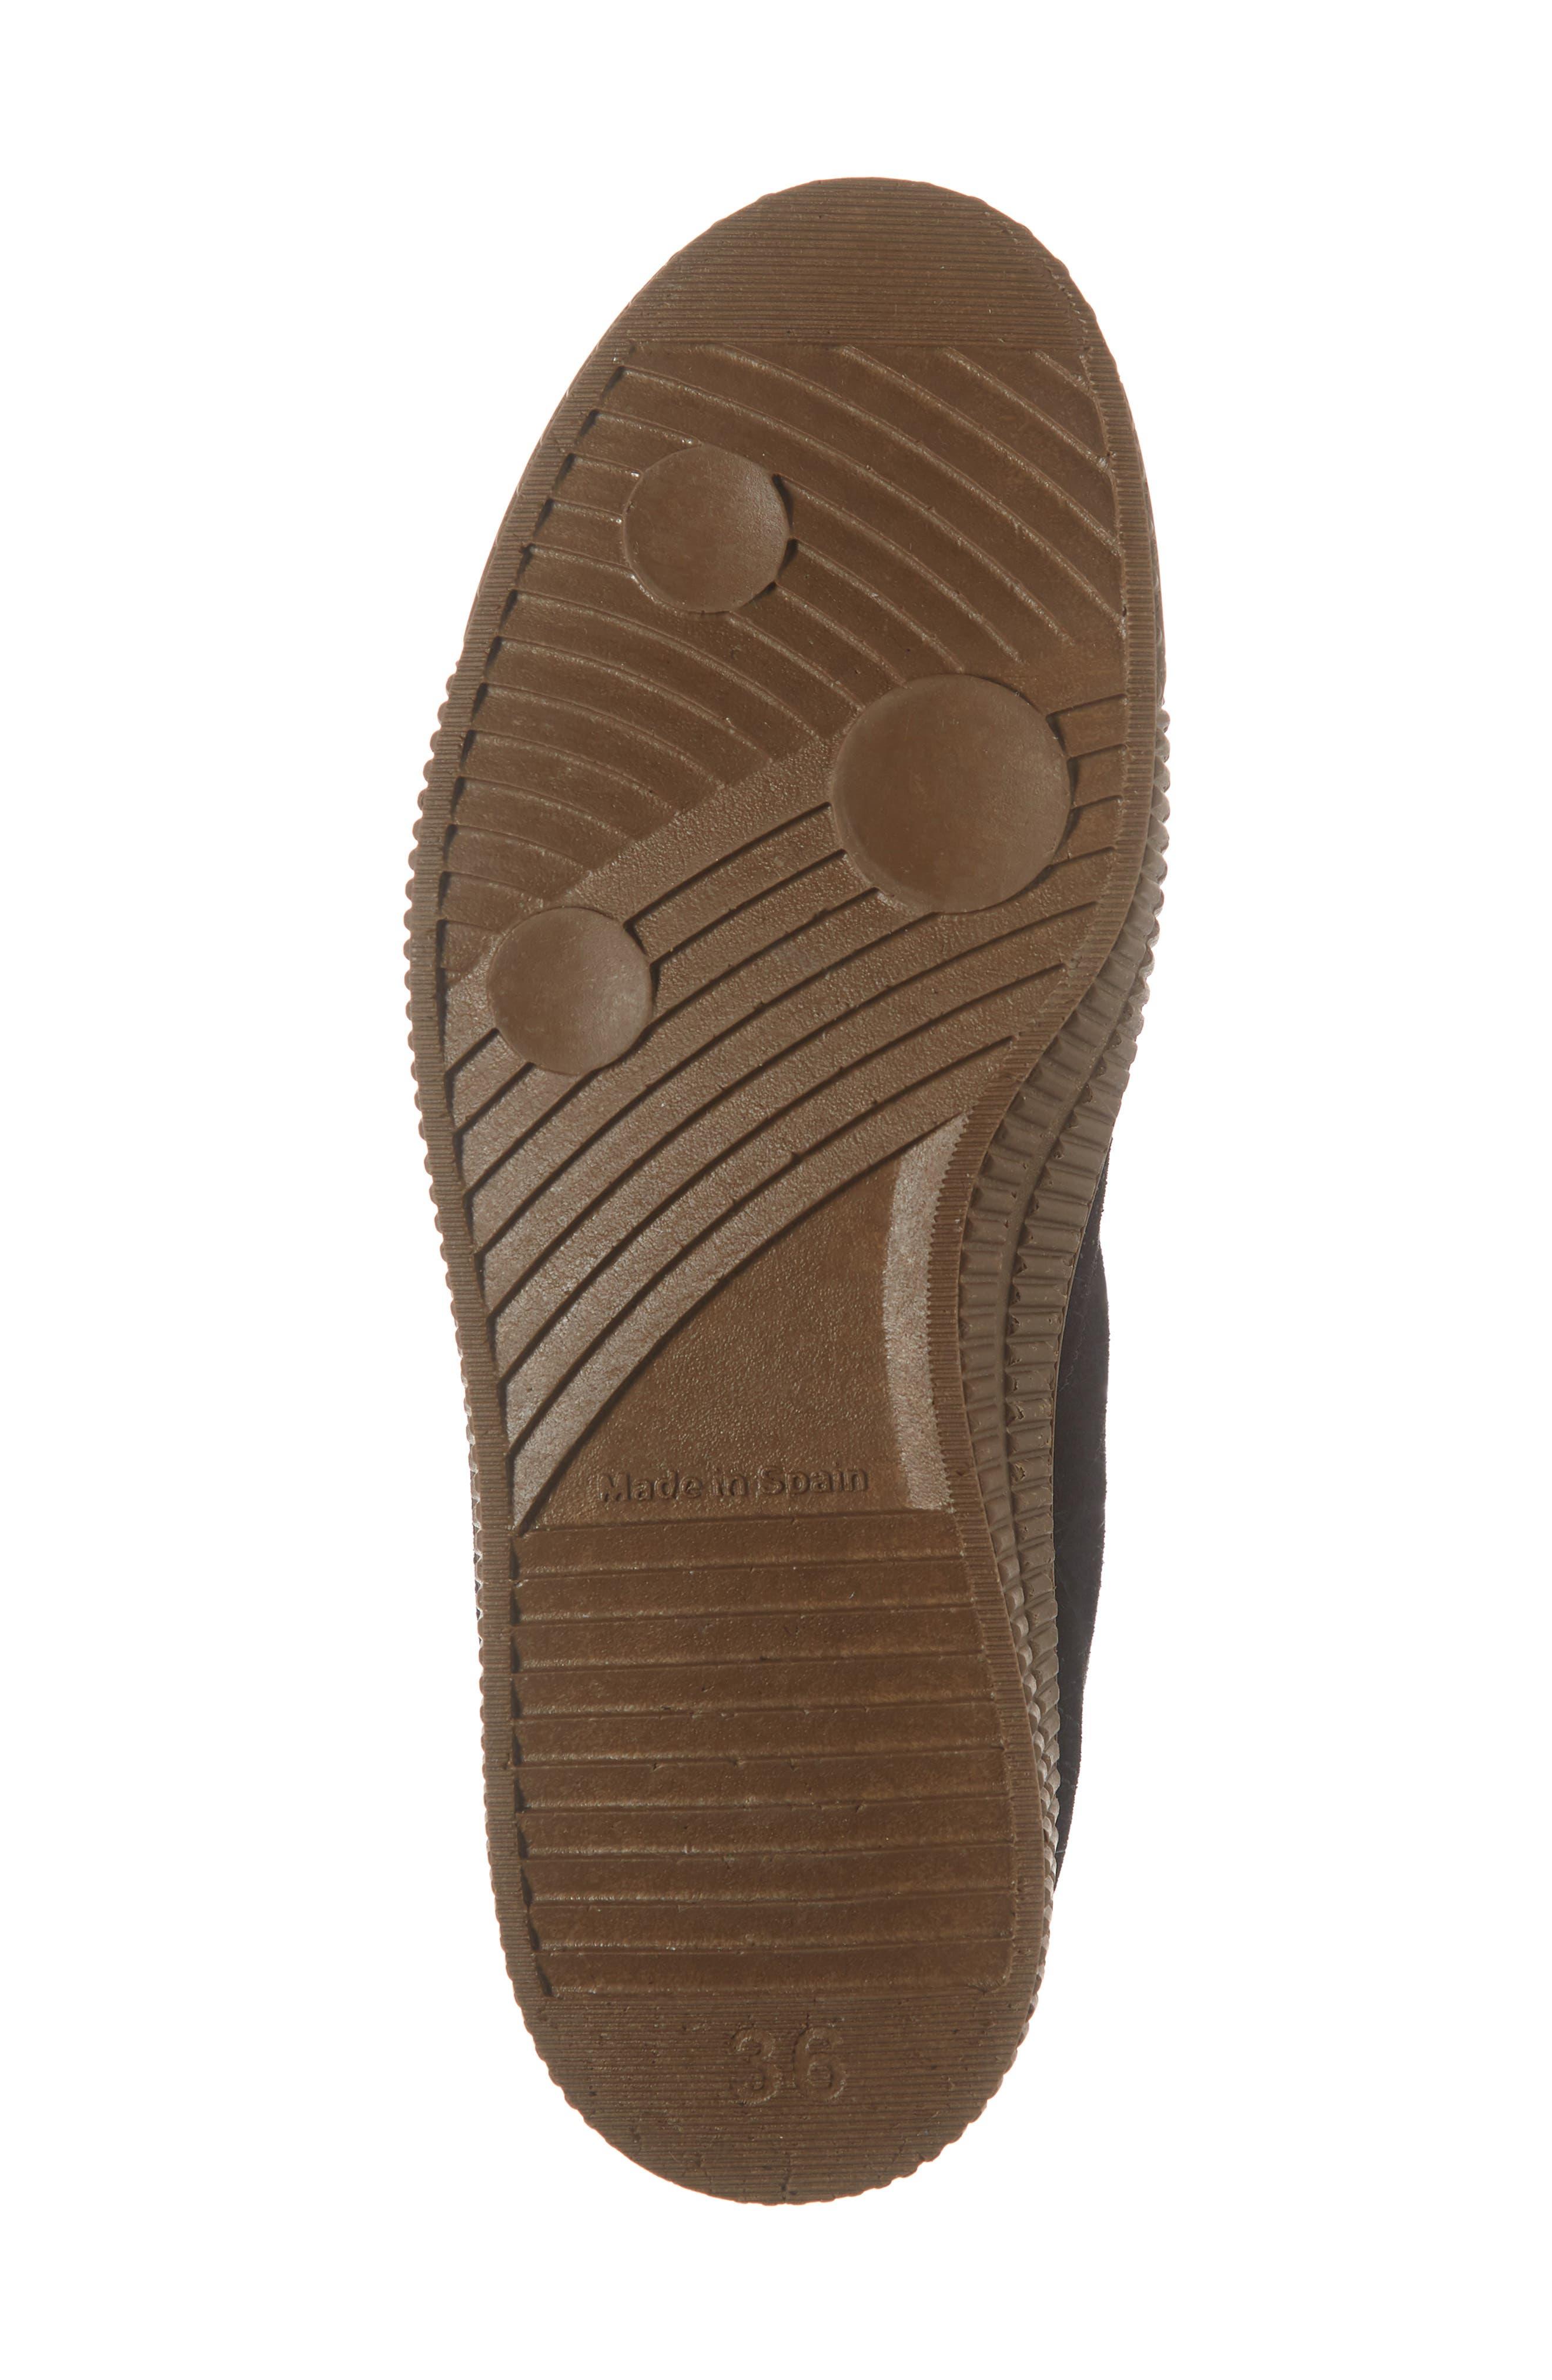 Femp High Top Sneaker,                             Alternate thumbnail 6, color,                             001